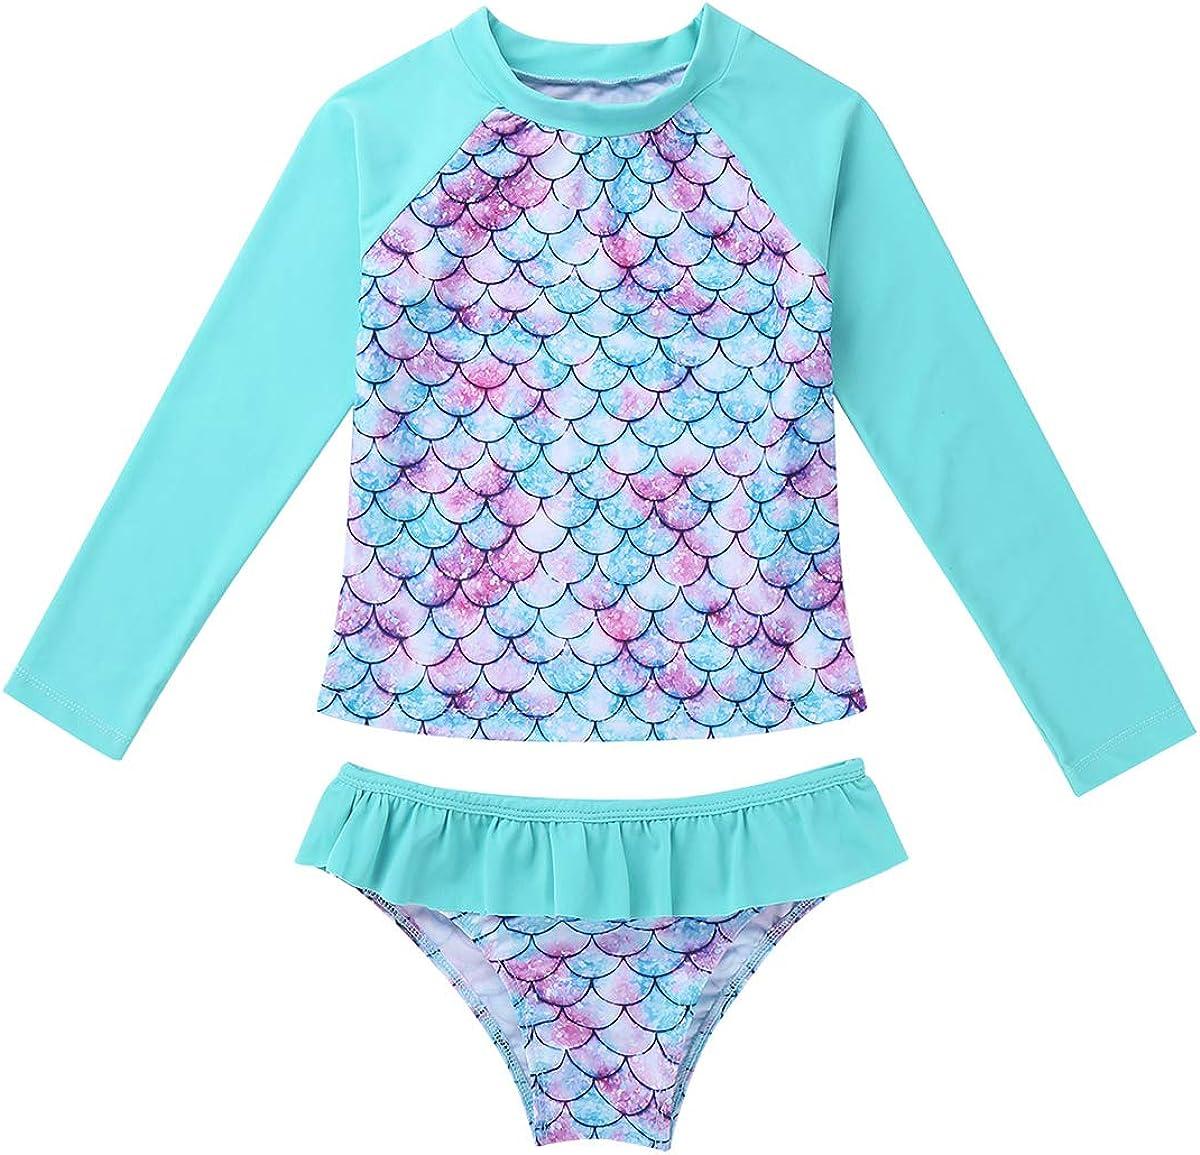 Choomomo 2PCS Kids Girls Swimsuit Set Long Sleeves Rash Guard Shirt Top Ruffles Bottom Bathing Suit